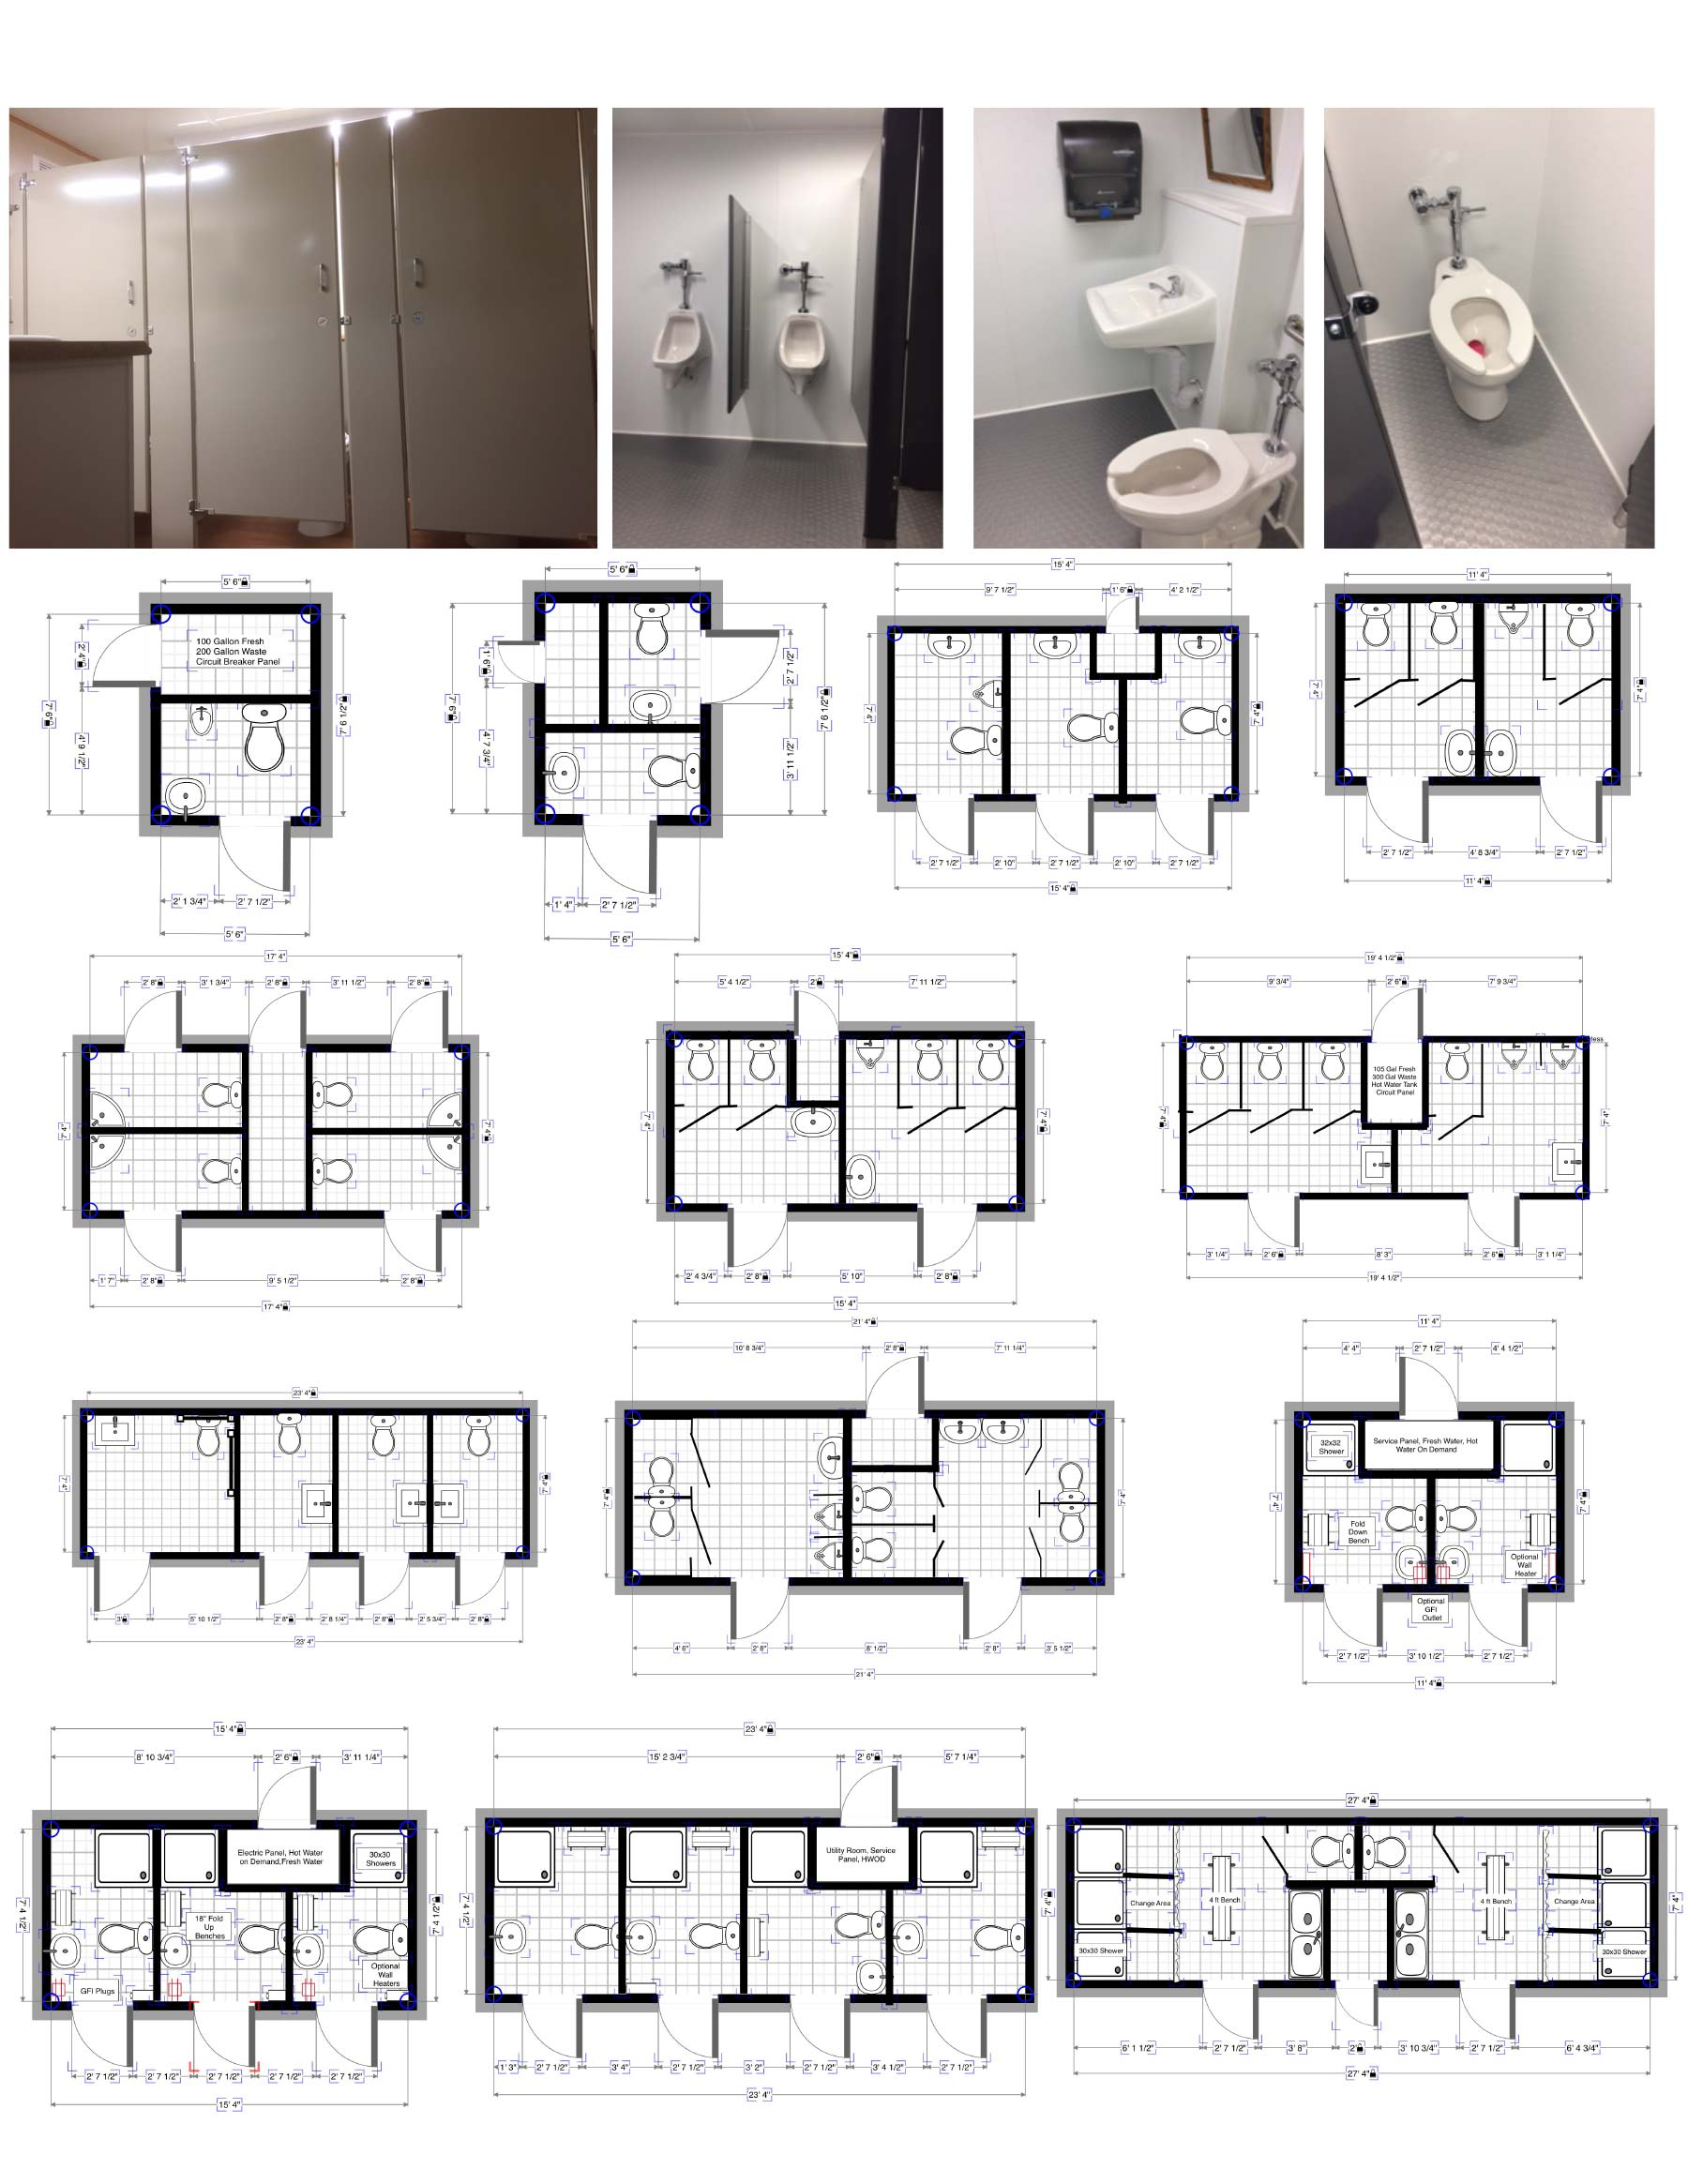 Commercial Grade Restroom Trailers